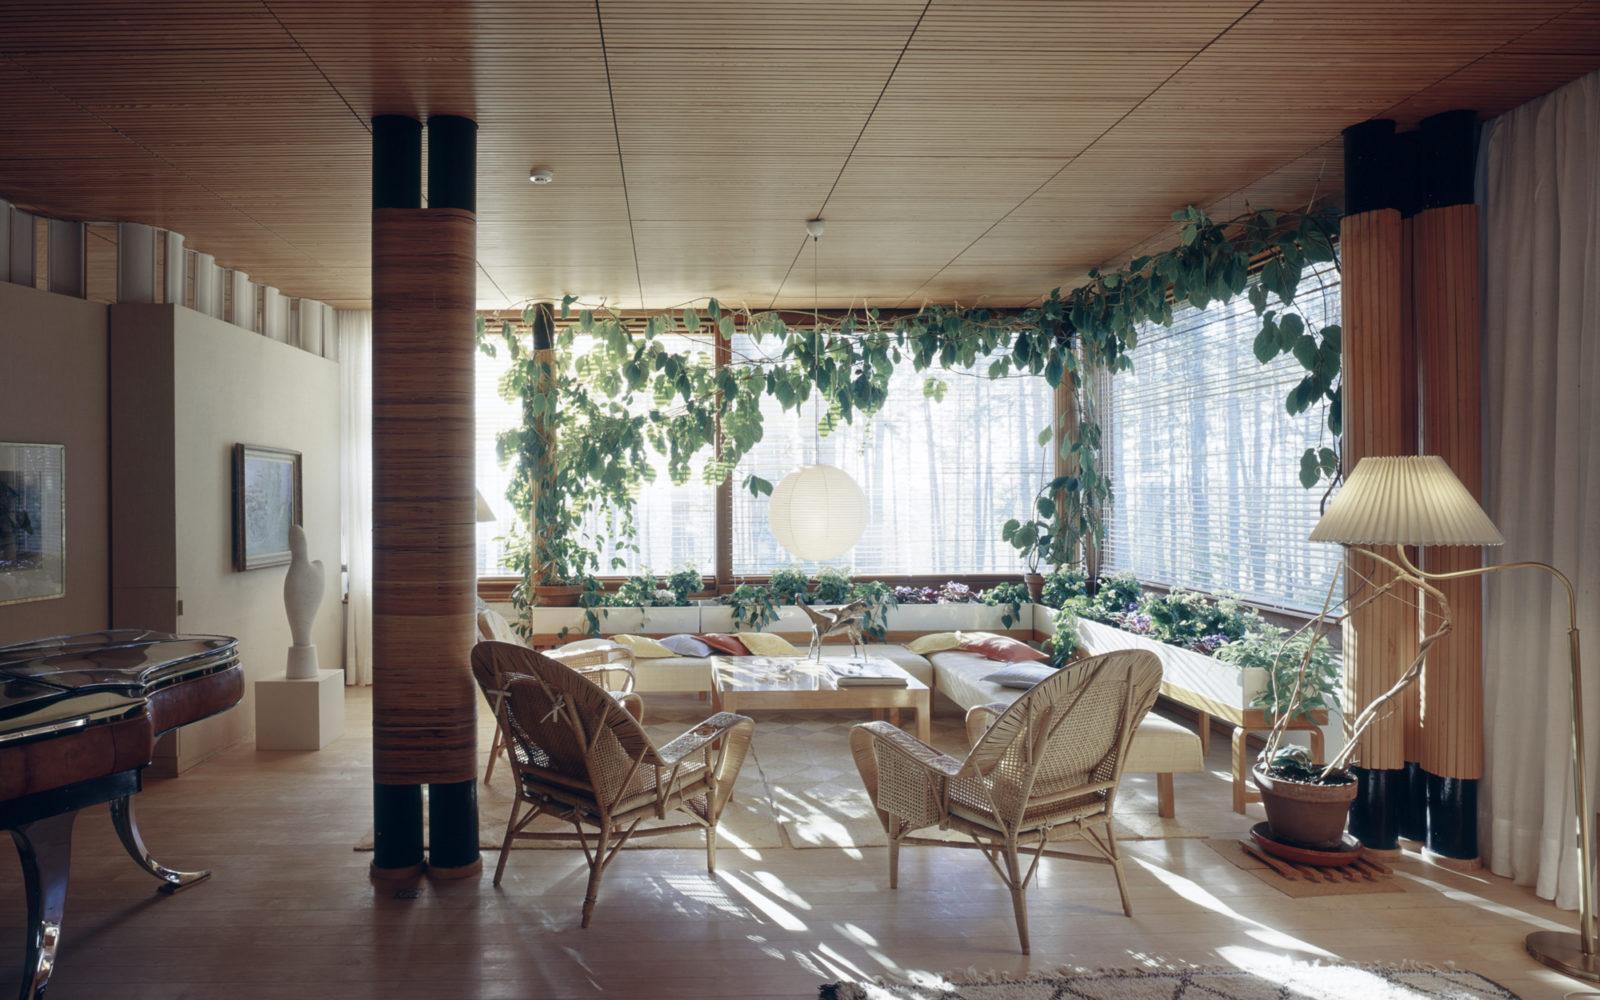 Villa-Mairea-Noormarkku-photo-maija-holma-alvar-aalto-museo_av 1983